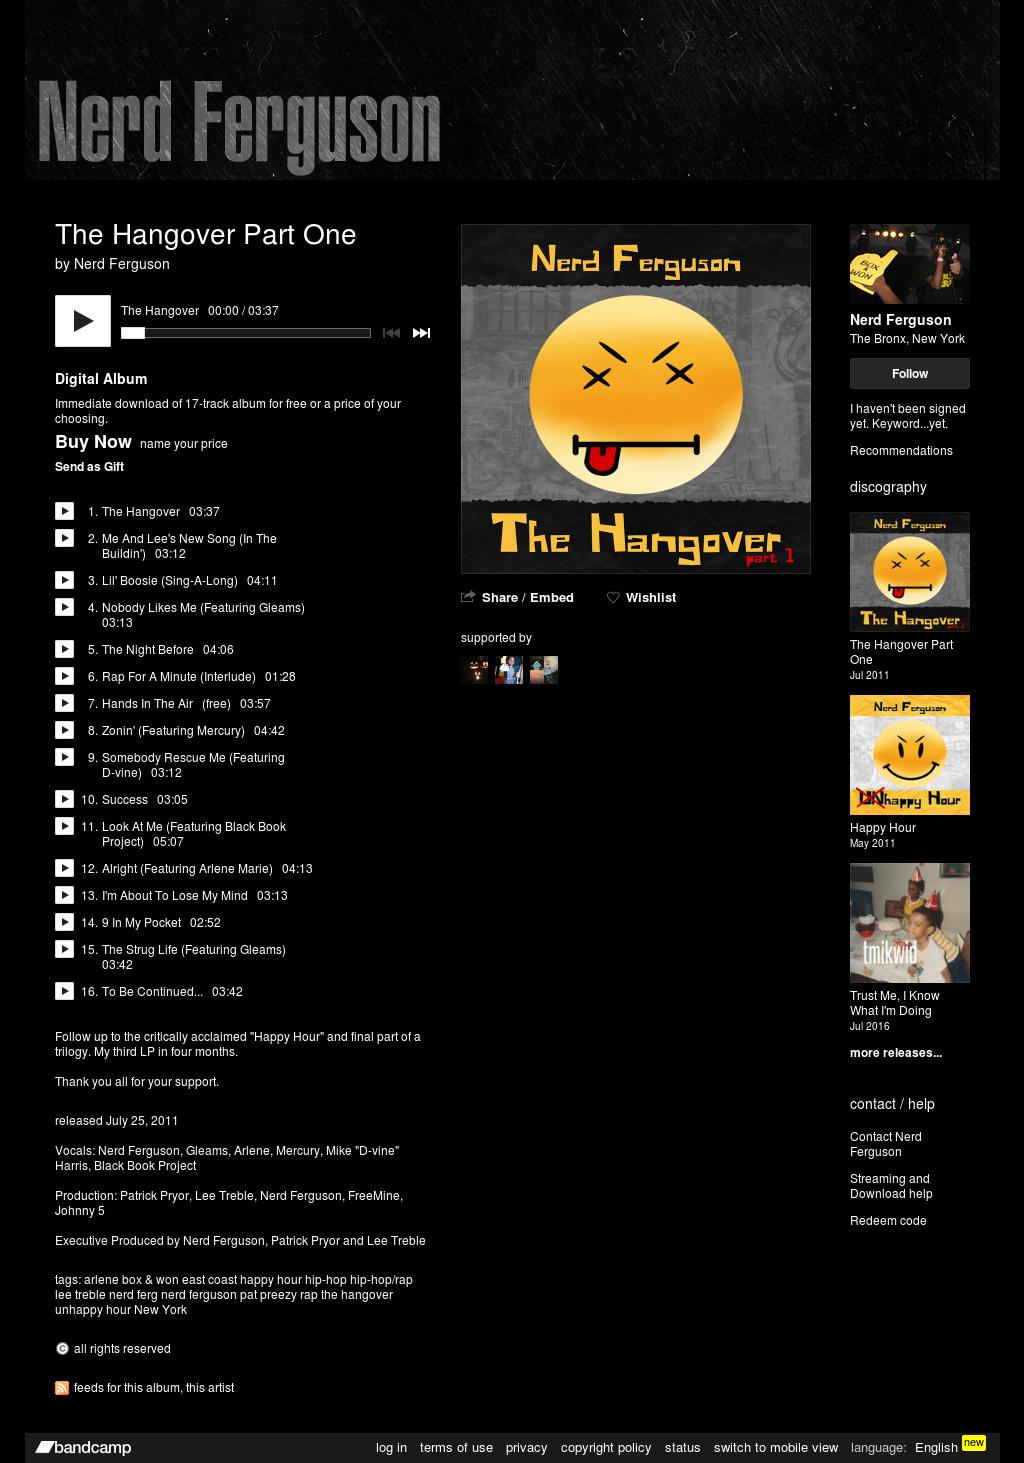 Nerd Ferguson Competitors, Revenue and Employees - Owler